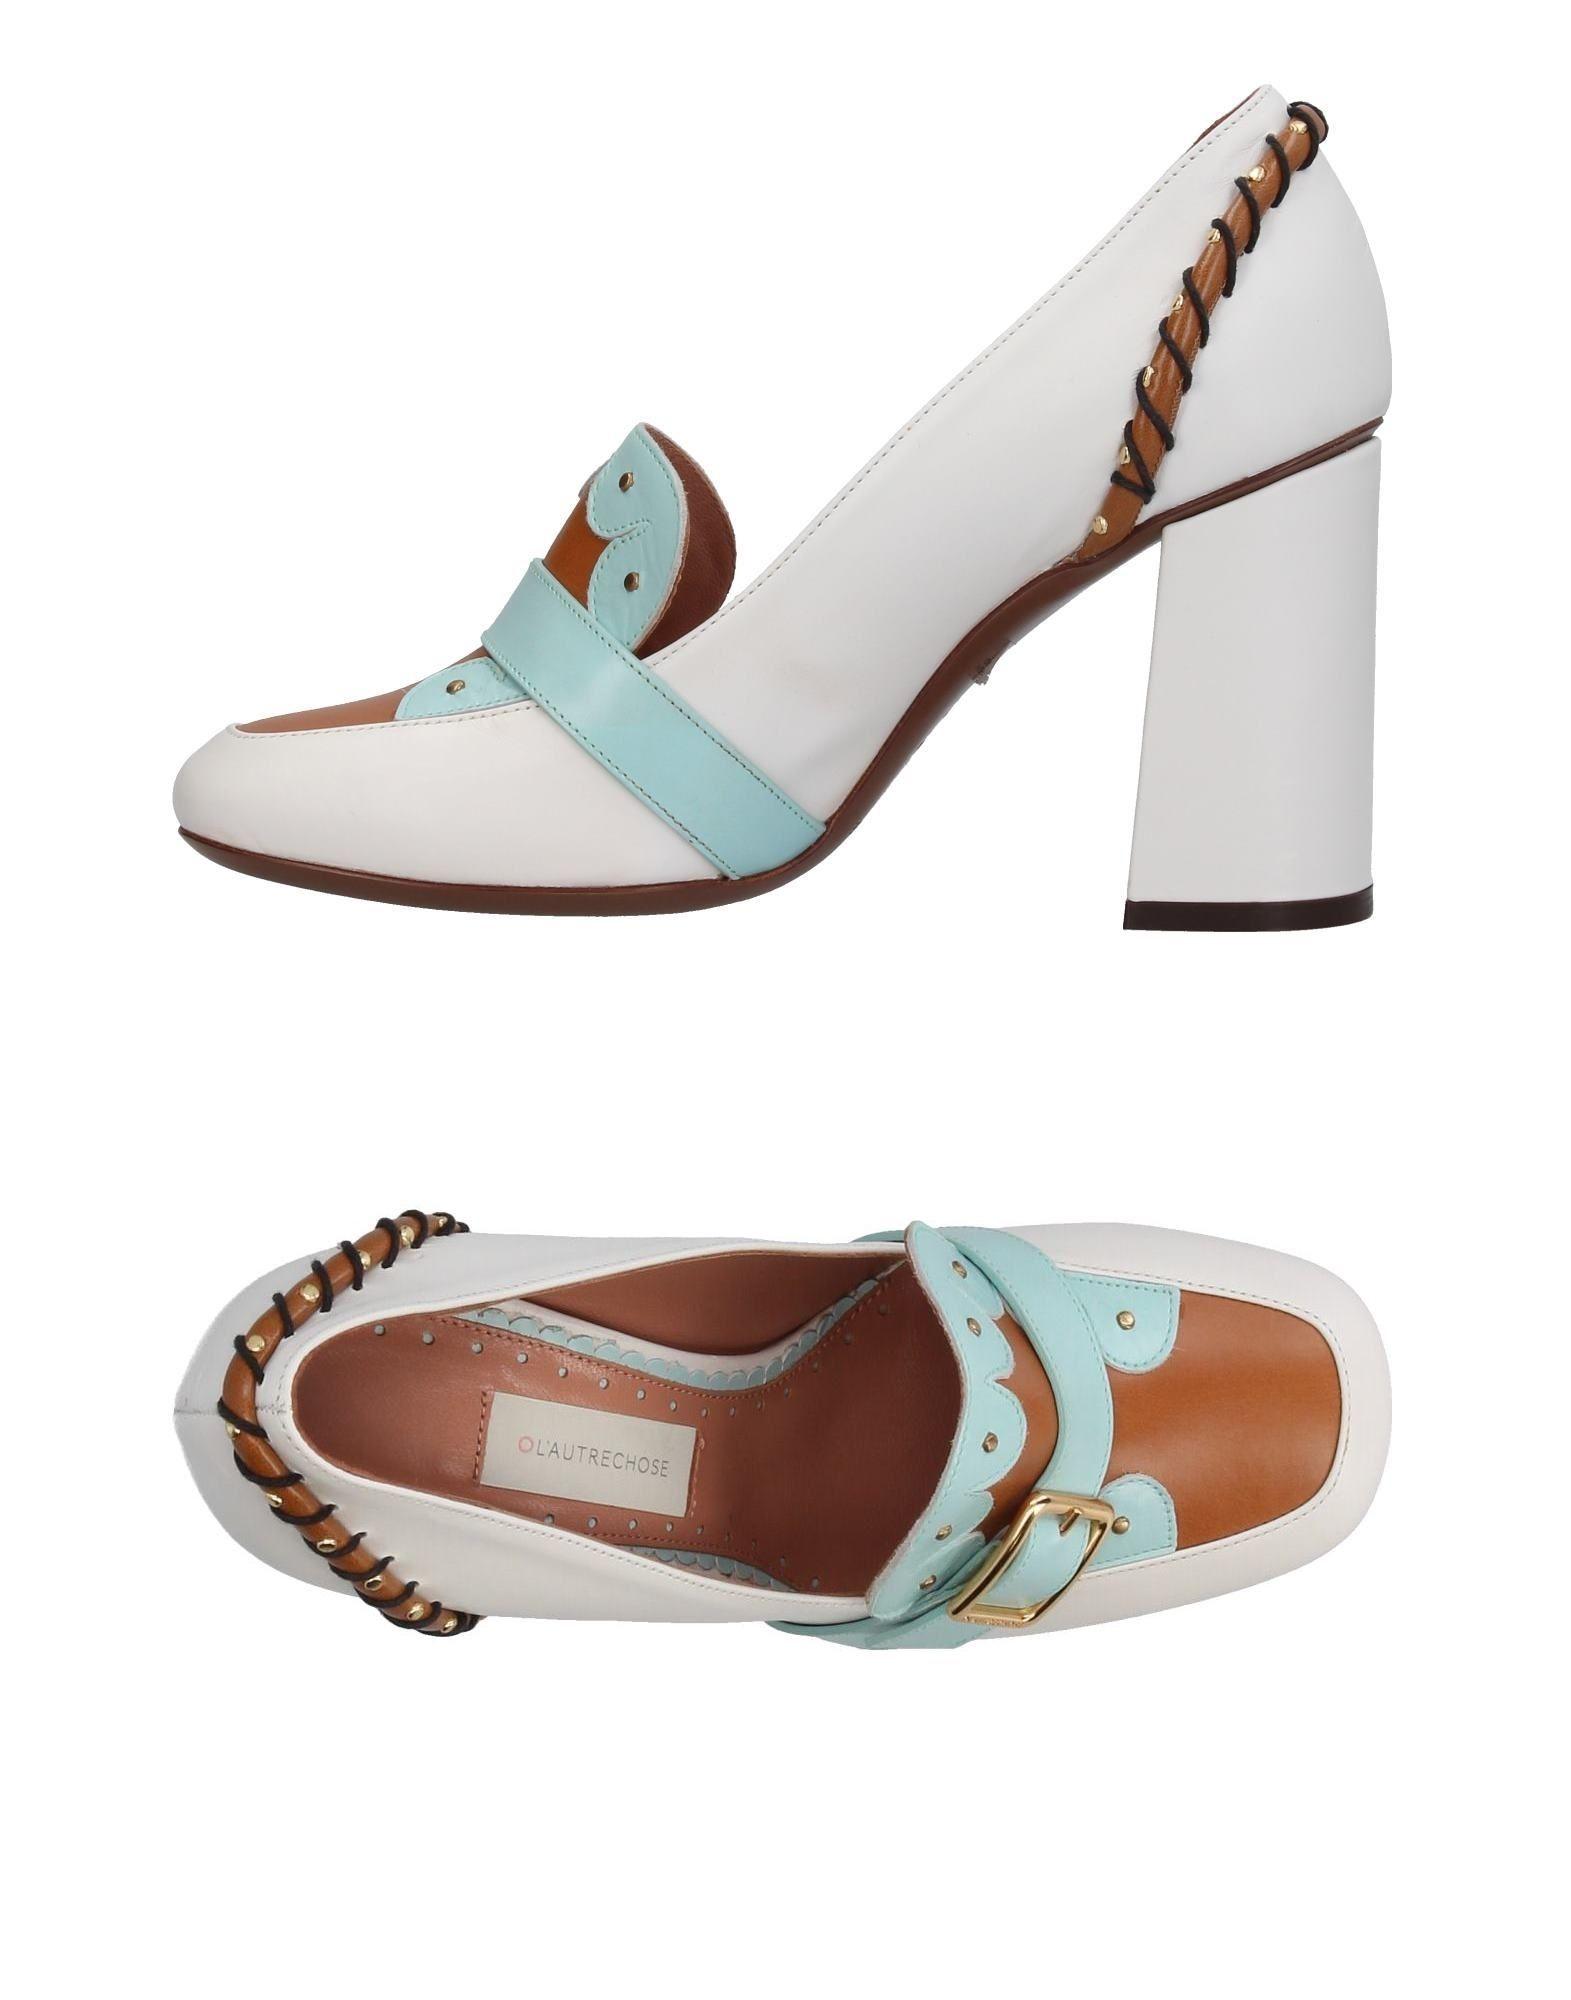 L' Autre Chose Mokassins Neue Damen  11383793AA Neue Mokassins Schuhe 103130